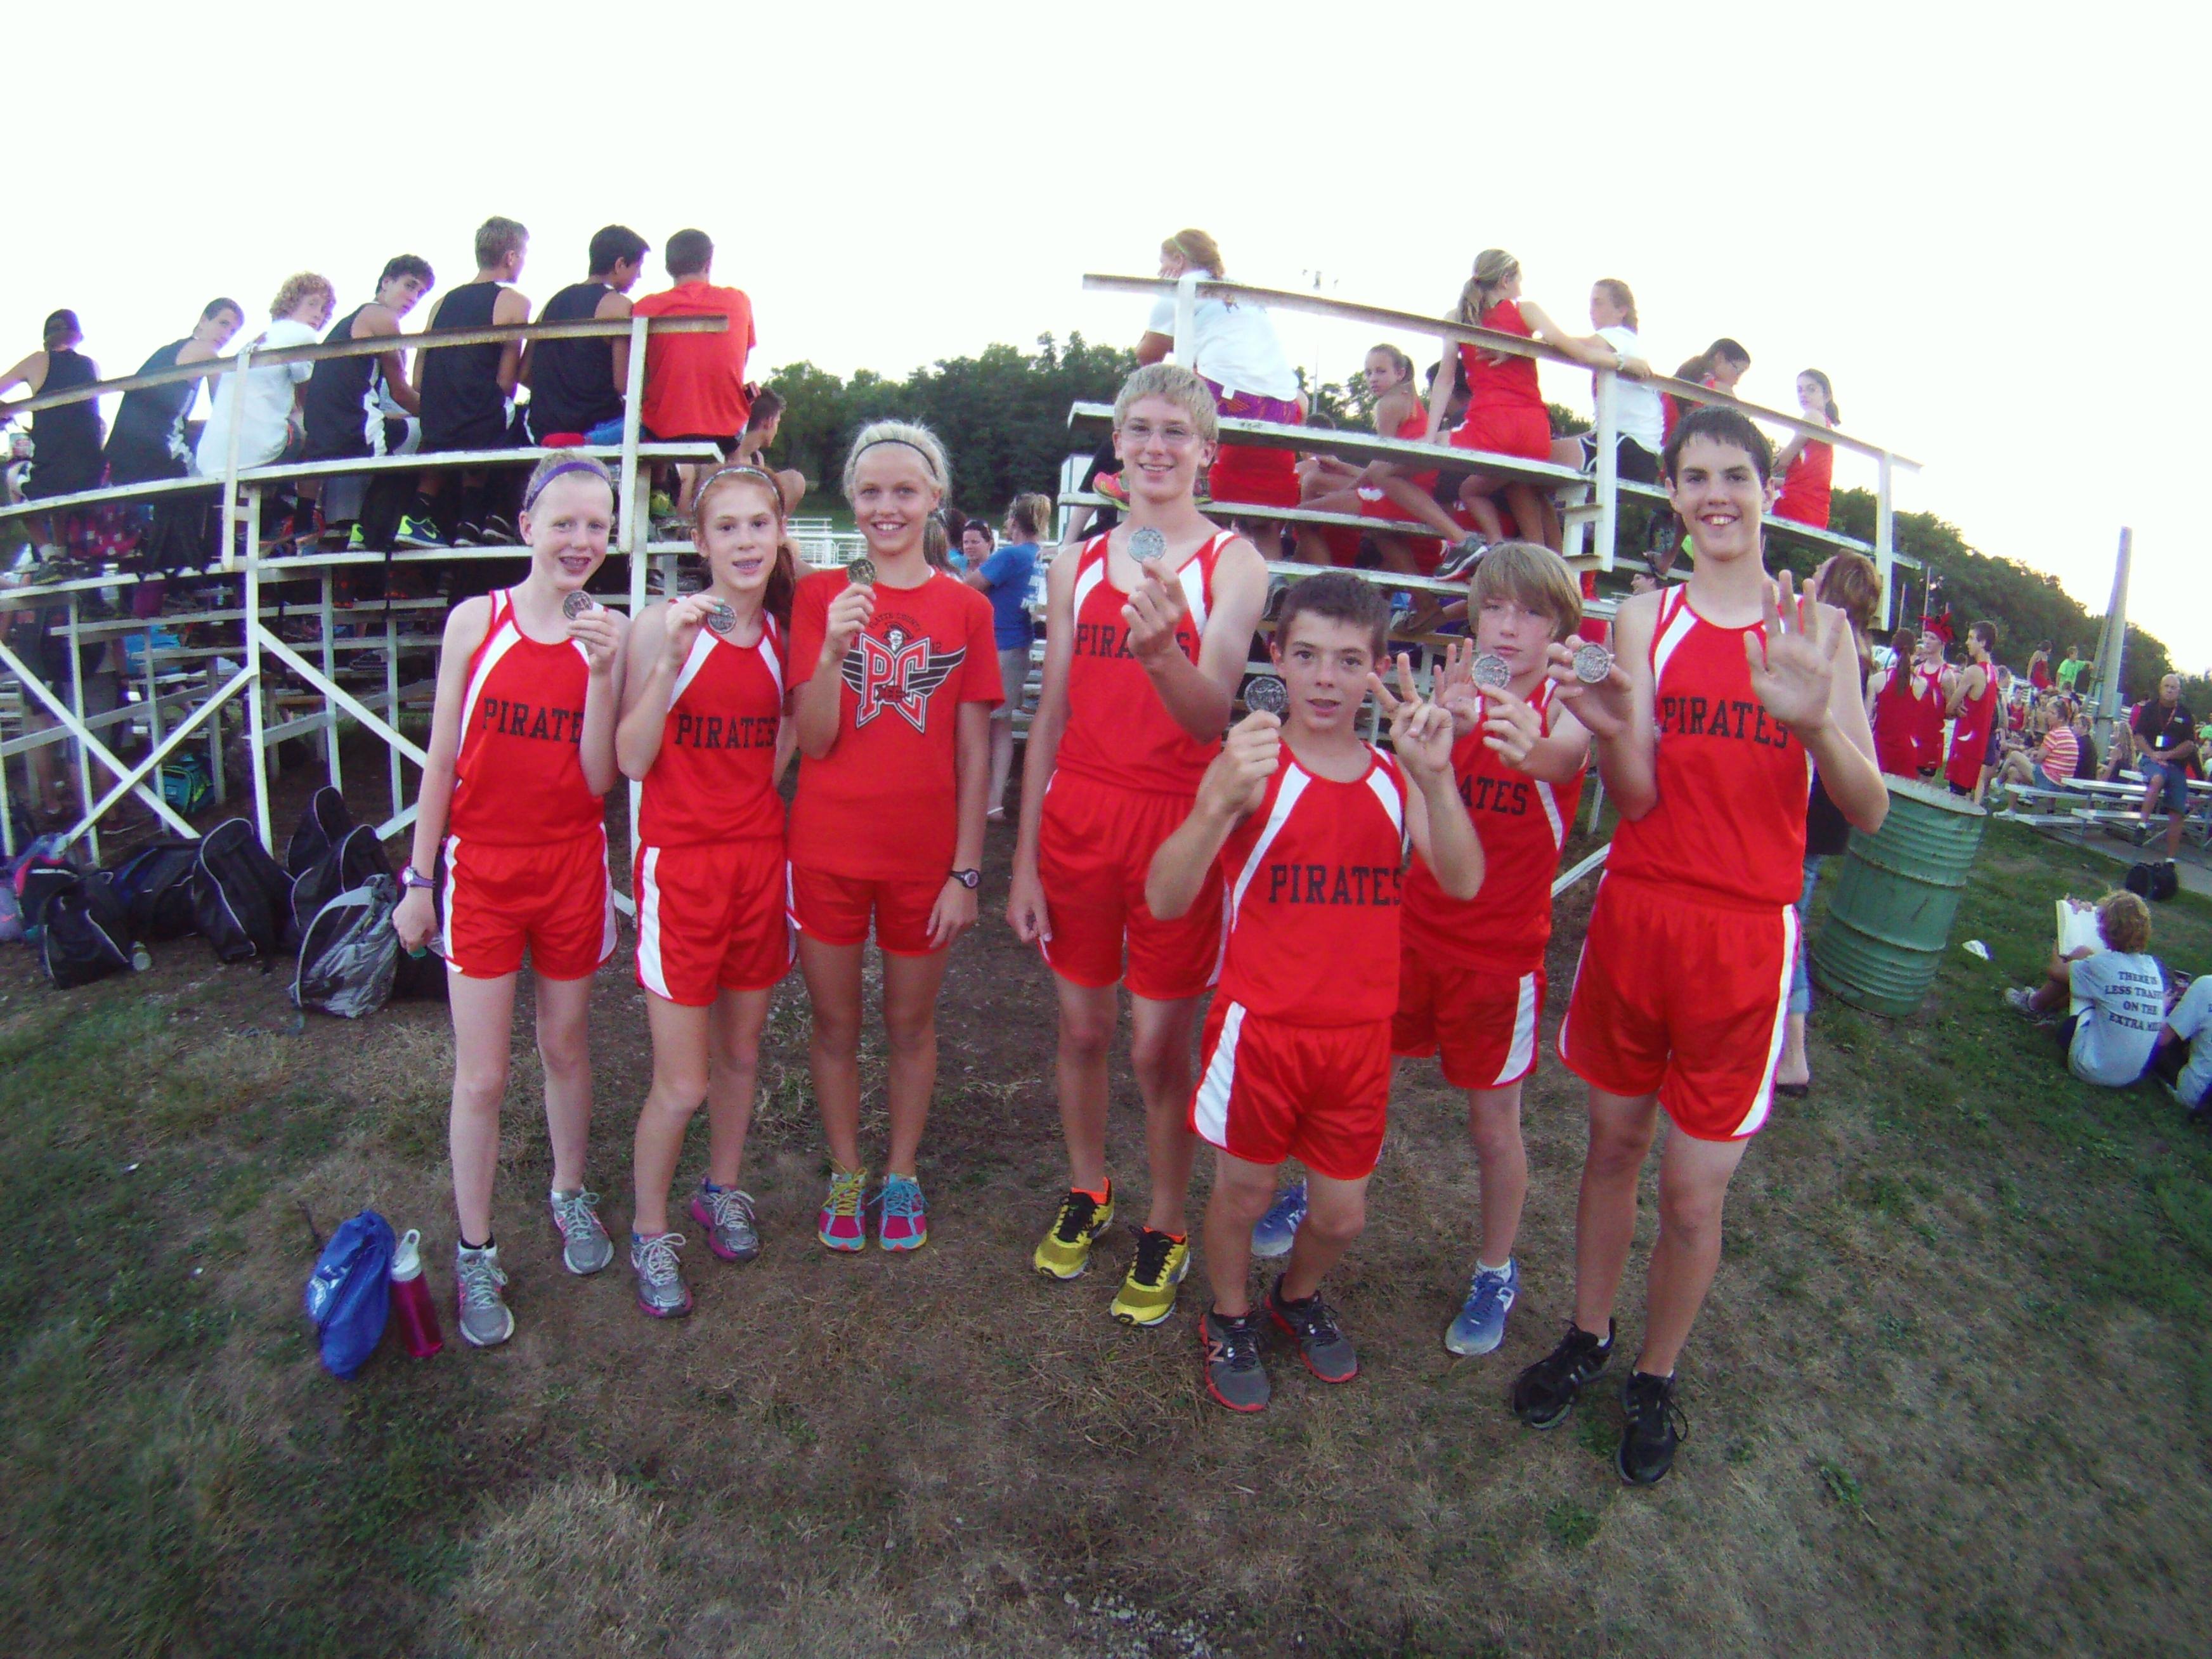 2013 ohio middle school cross country meet